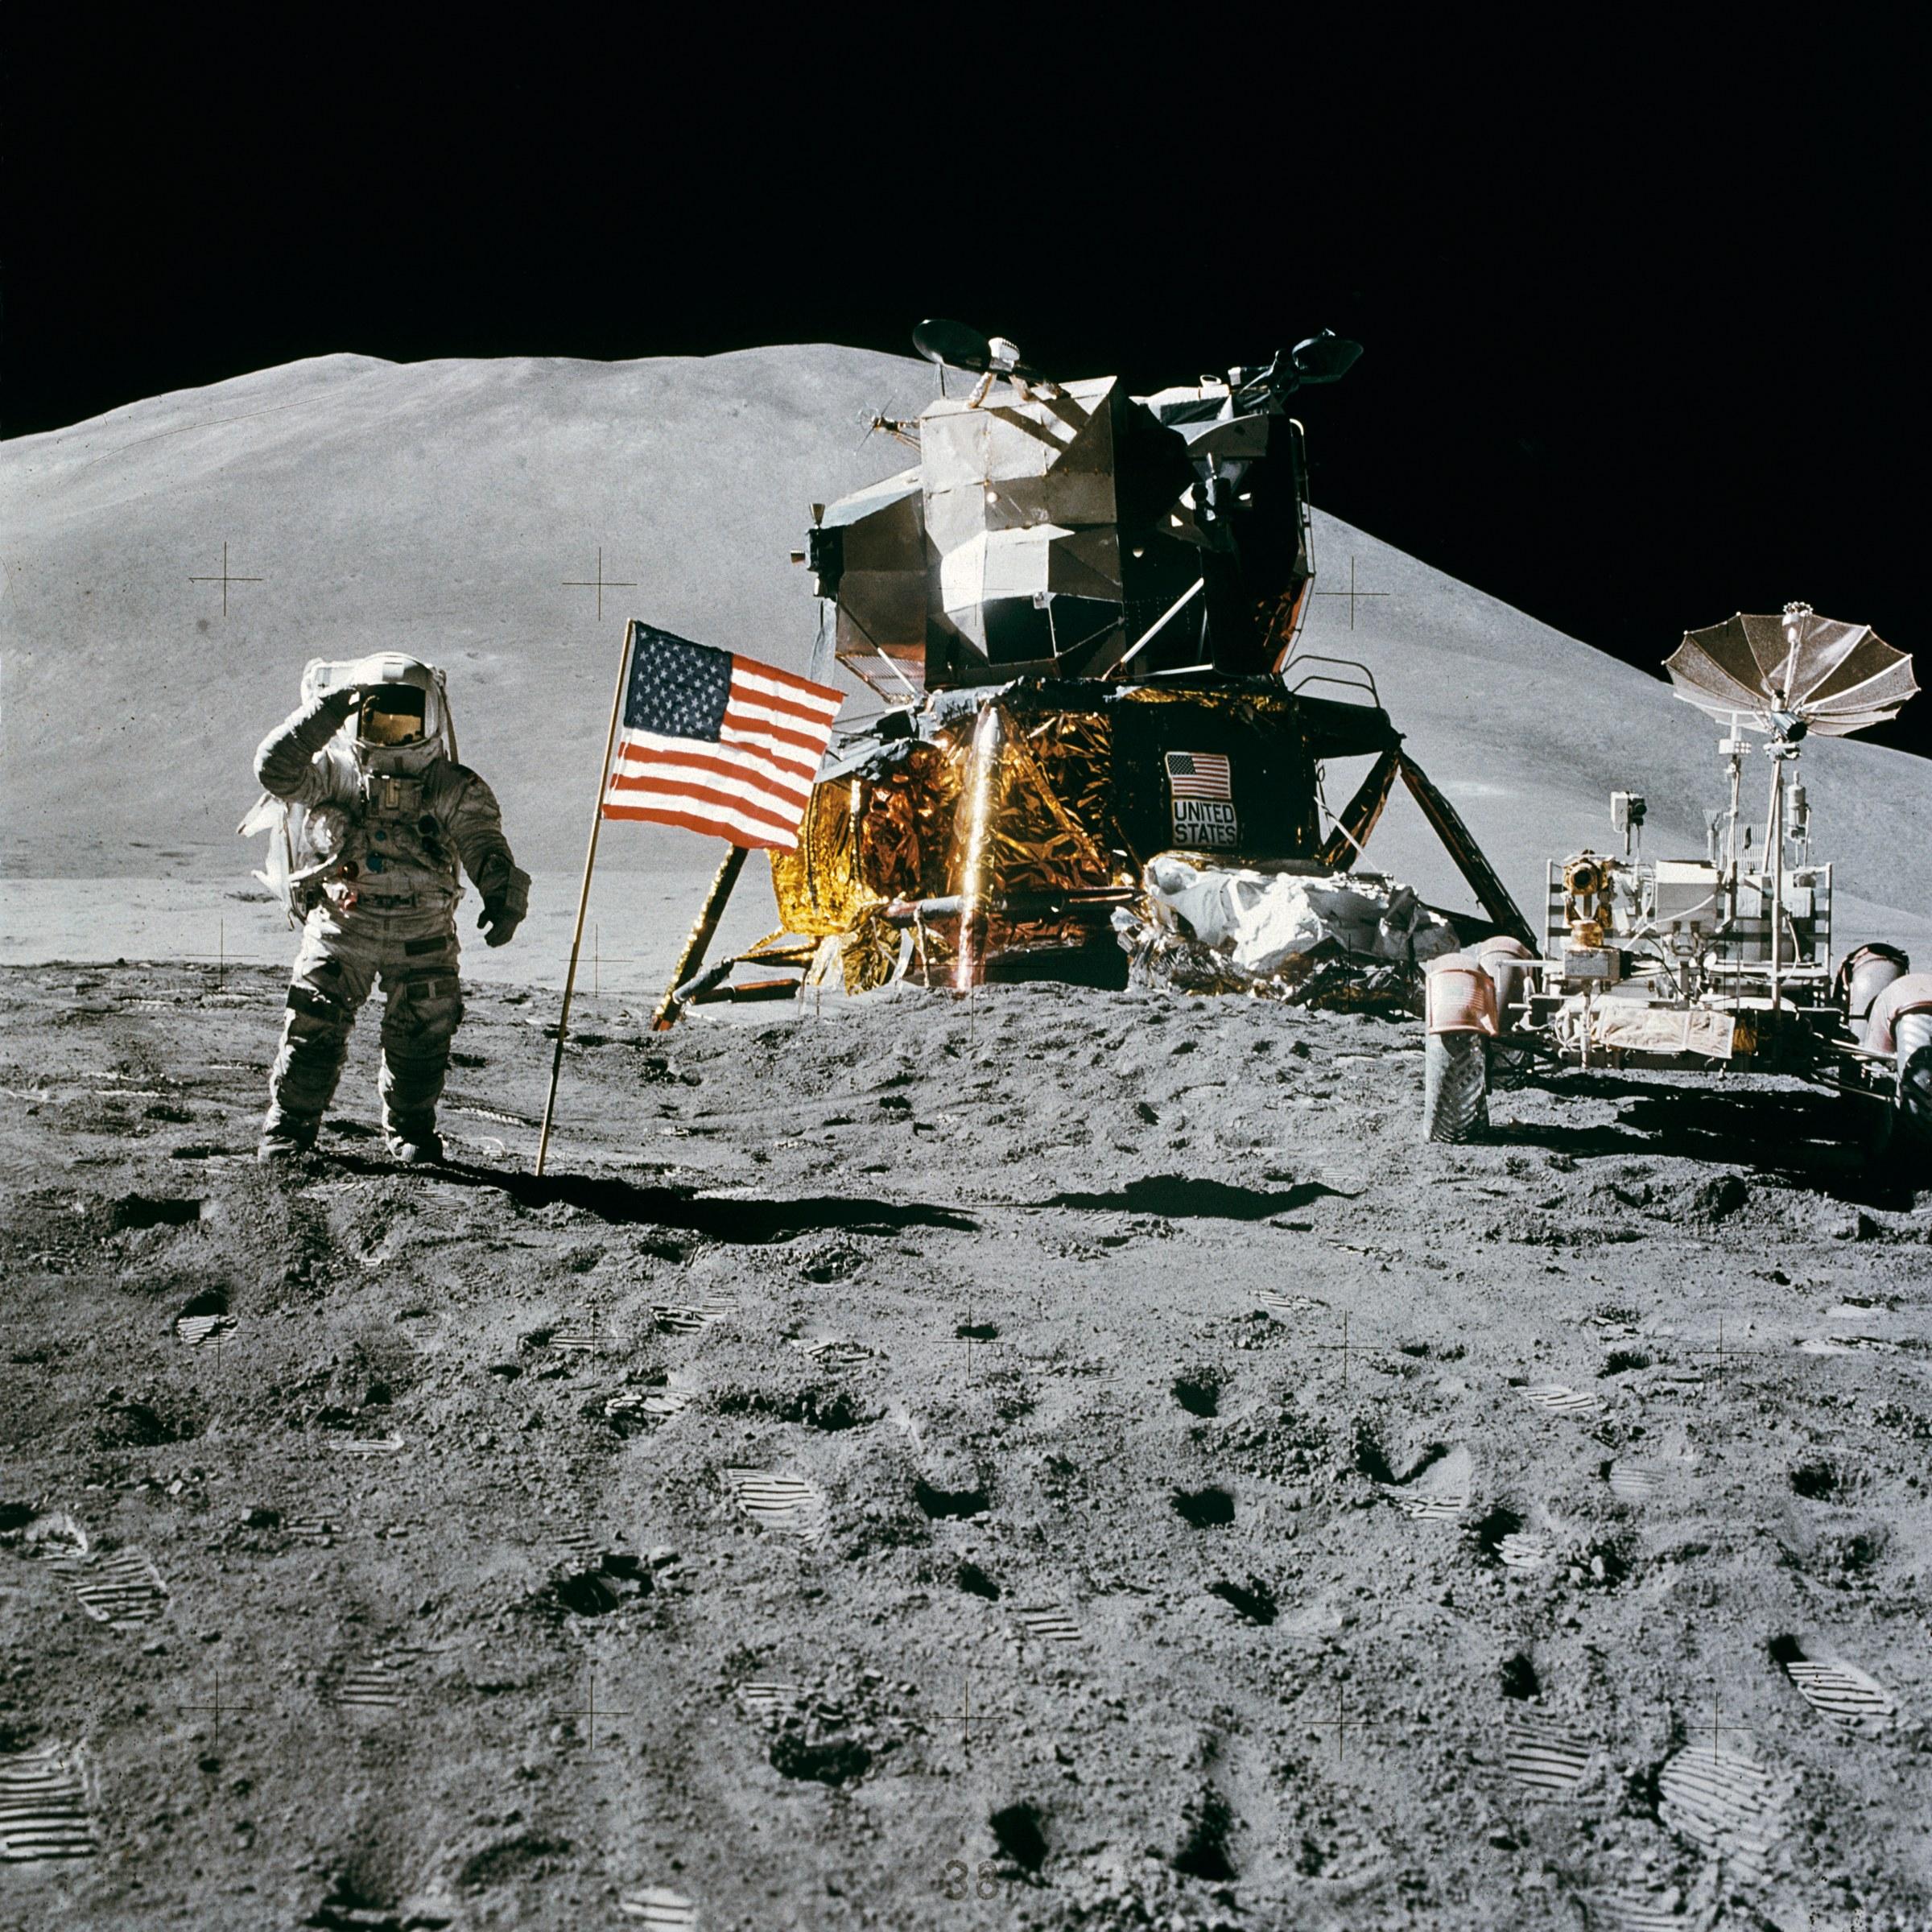 Apollo_15_flag,_rover,_LM,_Irwin